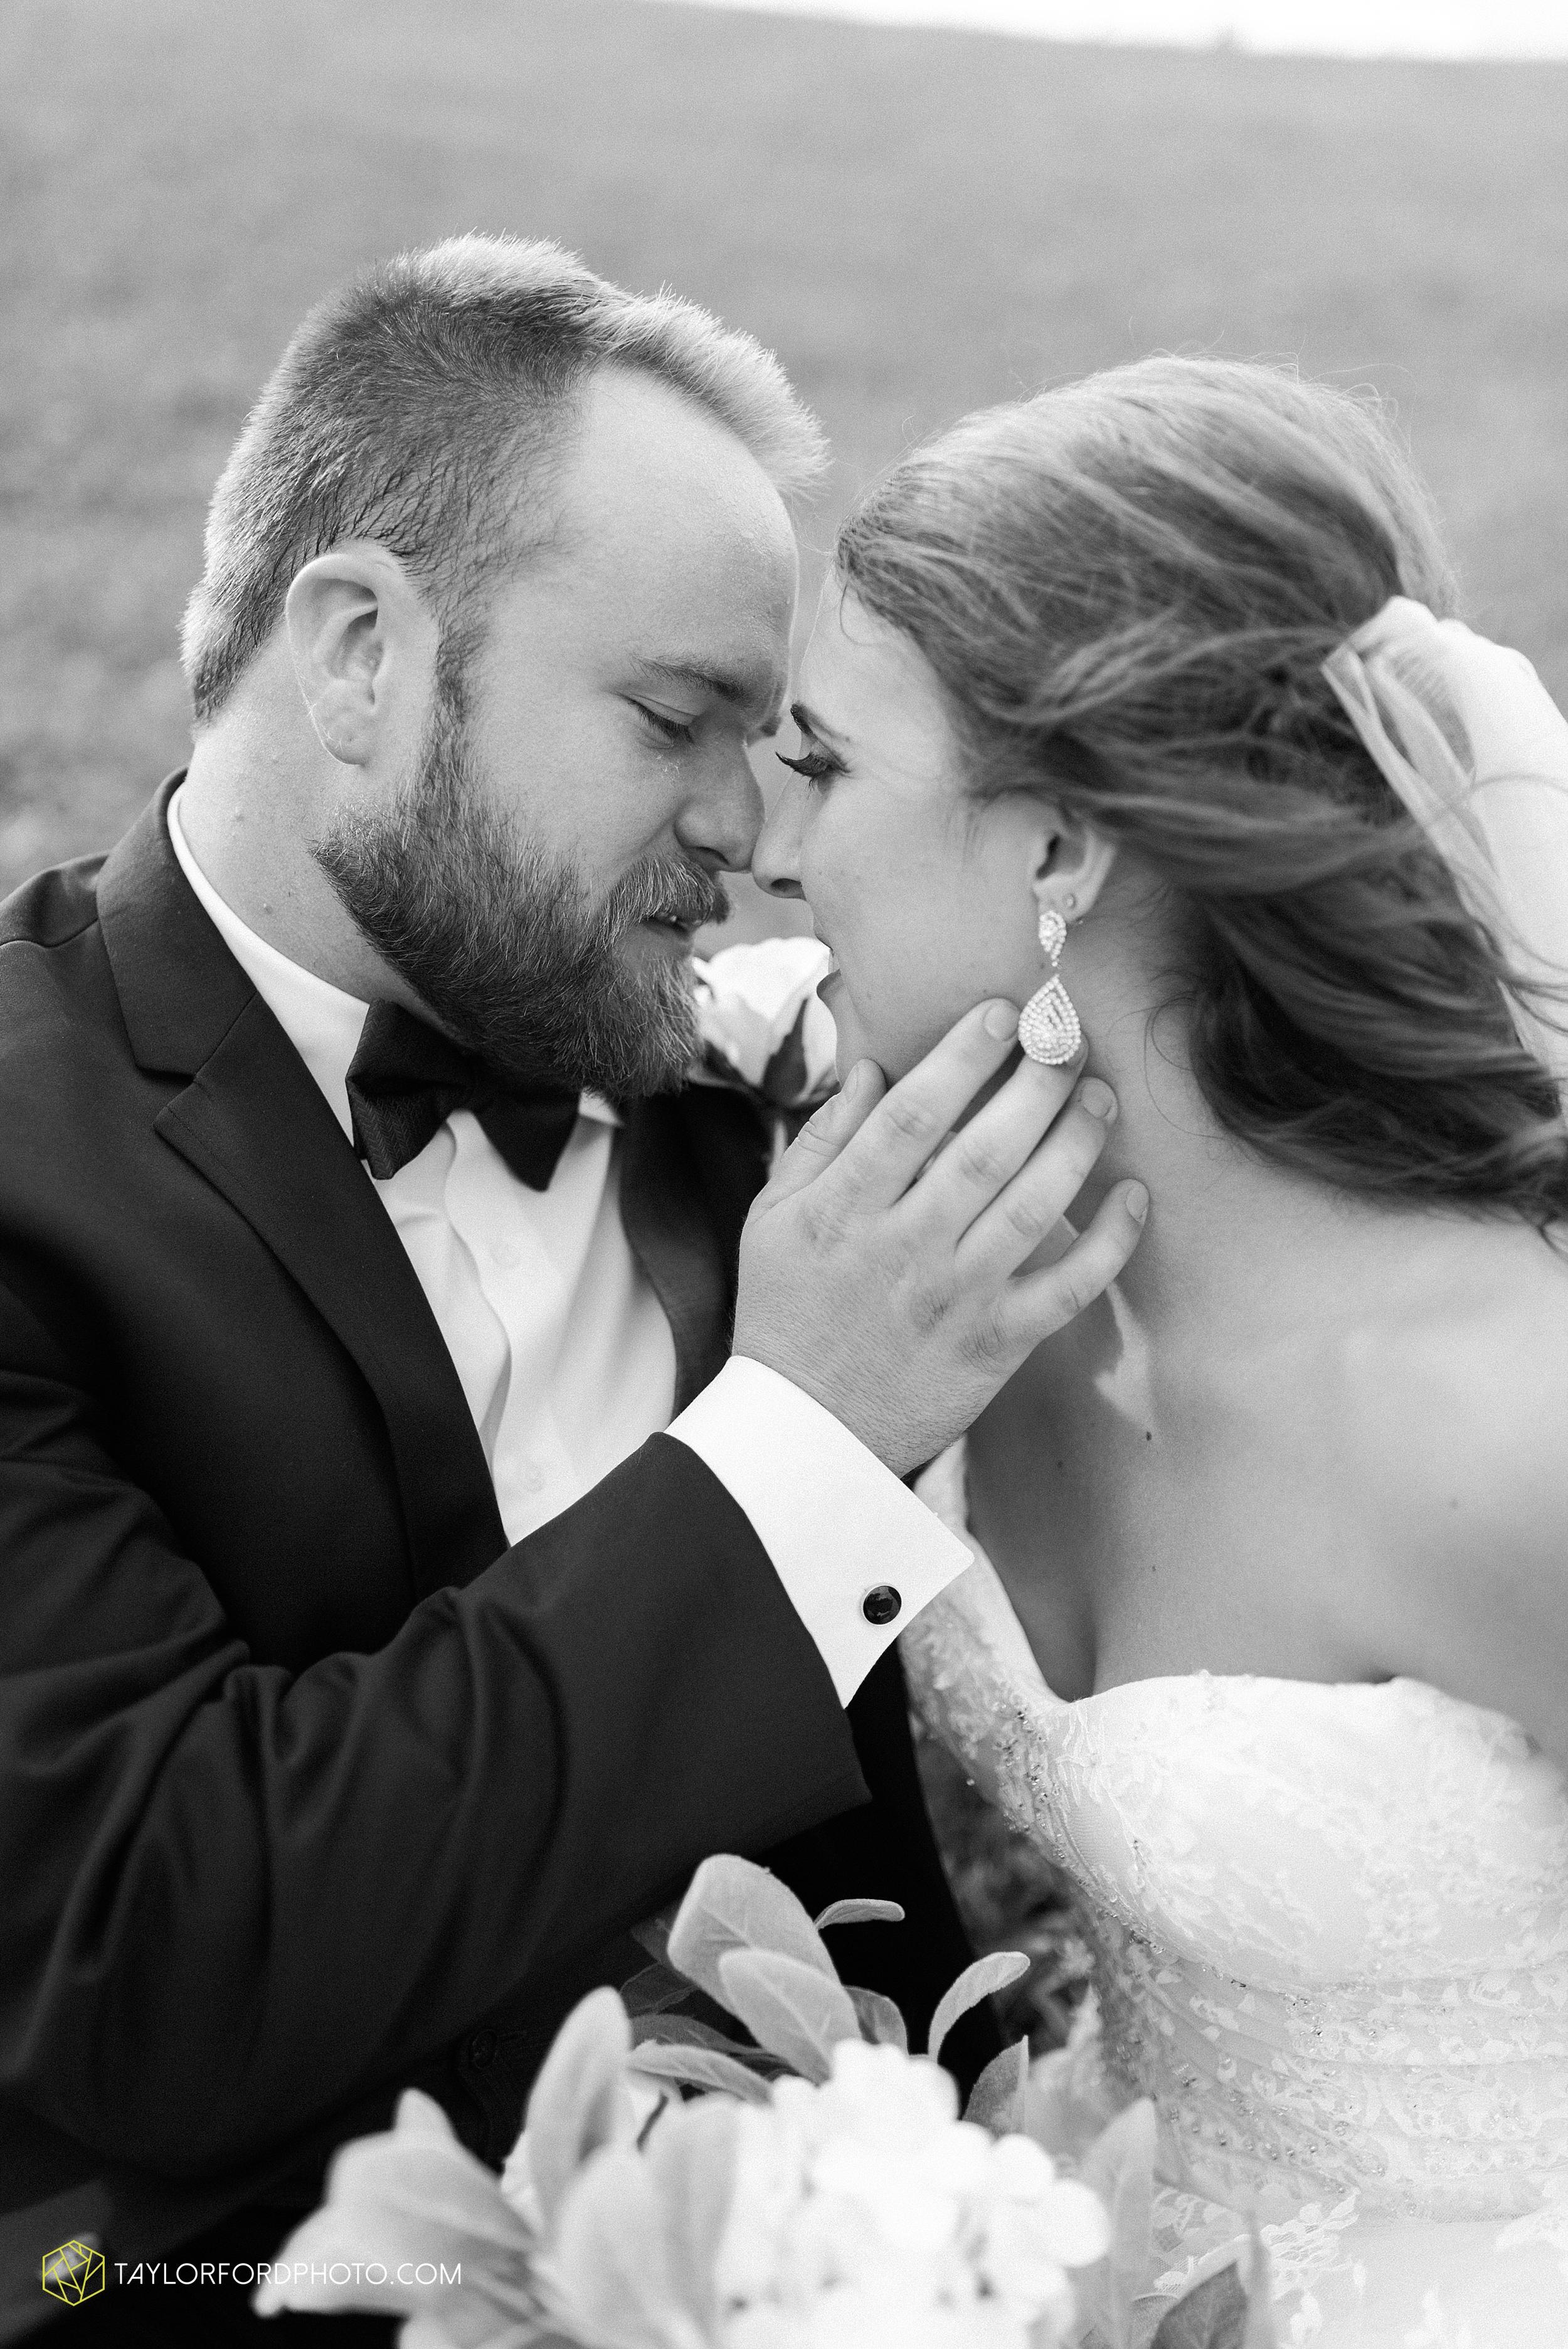 chelsey-zosh-jackson-young-first-united-methodist-church-senior-center-van-wert-ohio-wedding-photographer-taylor-ford-photography_0084.jpg